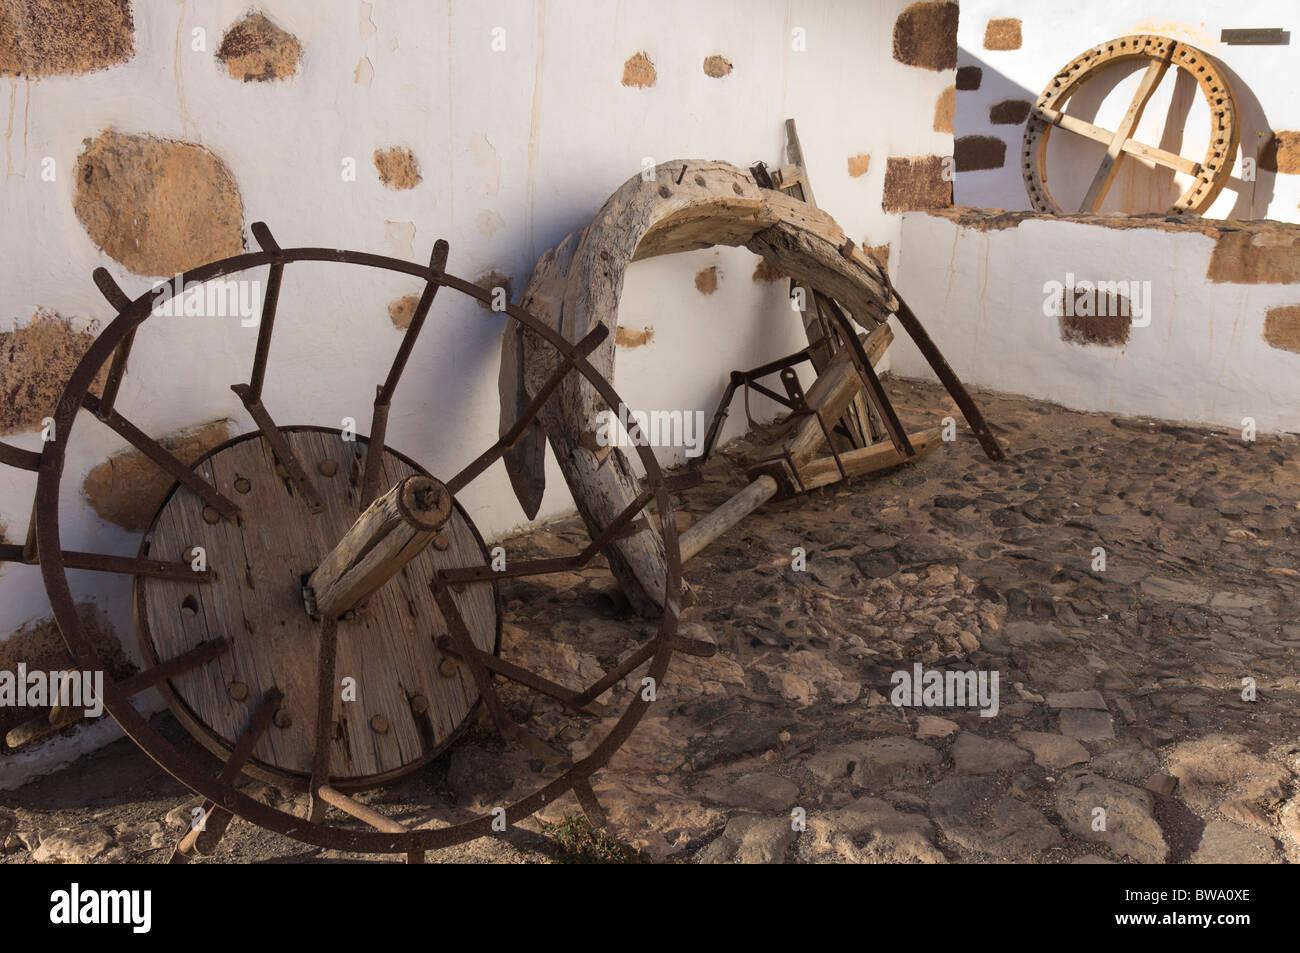 Fuerteventura, Canary Islands - El Alcogida Ecomuseum, Tefia. Wheelwright and blacksmith work. - Stock Image